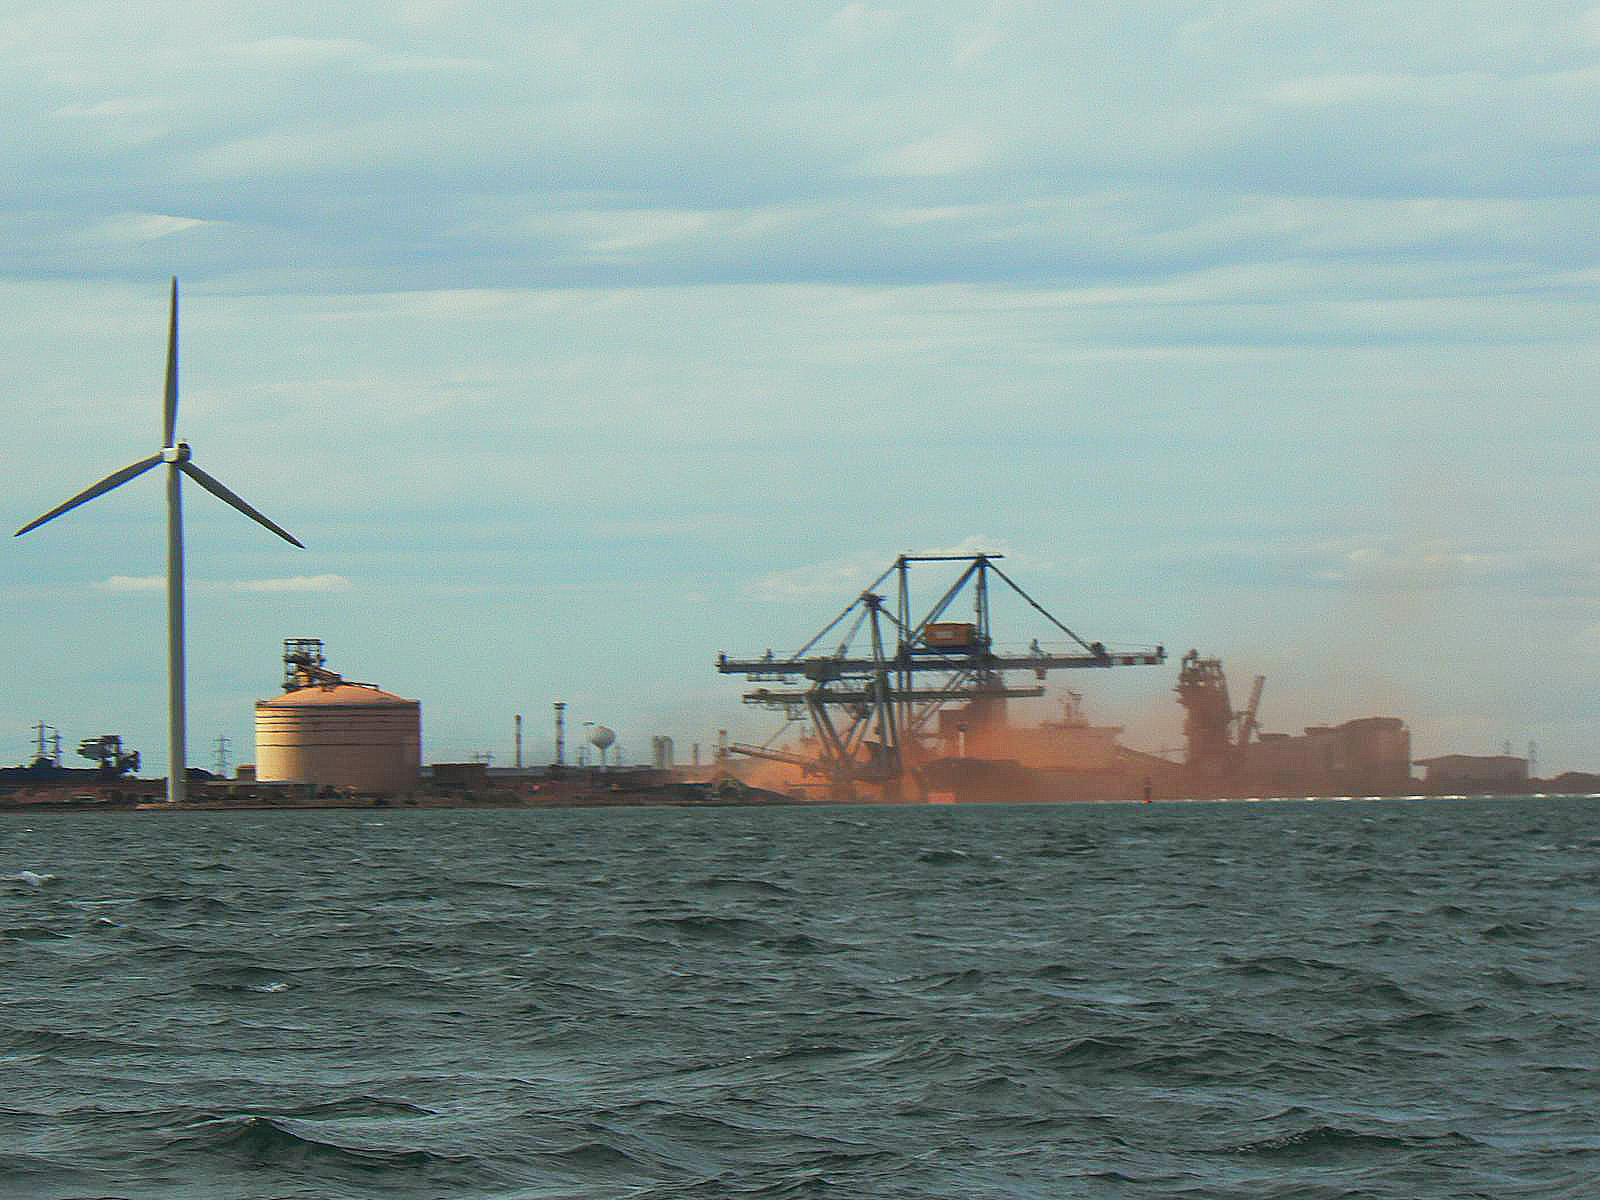 File port saint louis du rh ne le wikimedia commons - Port saint louis du rhone info ...